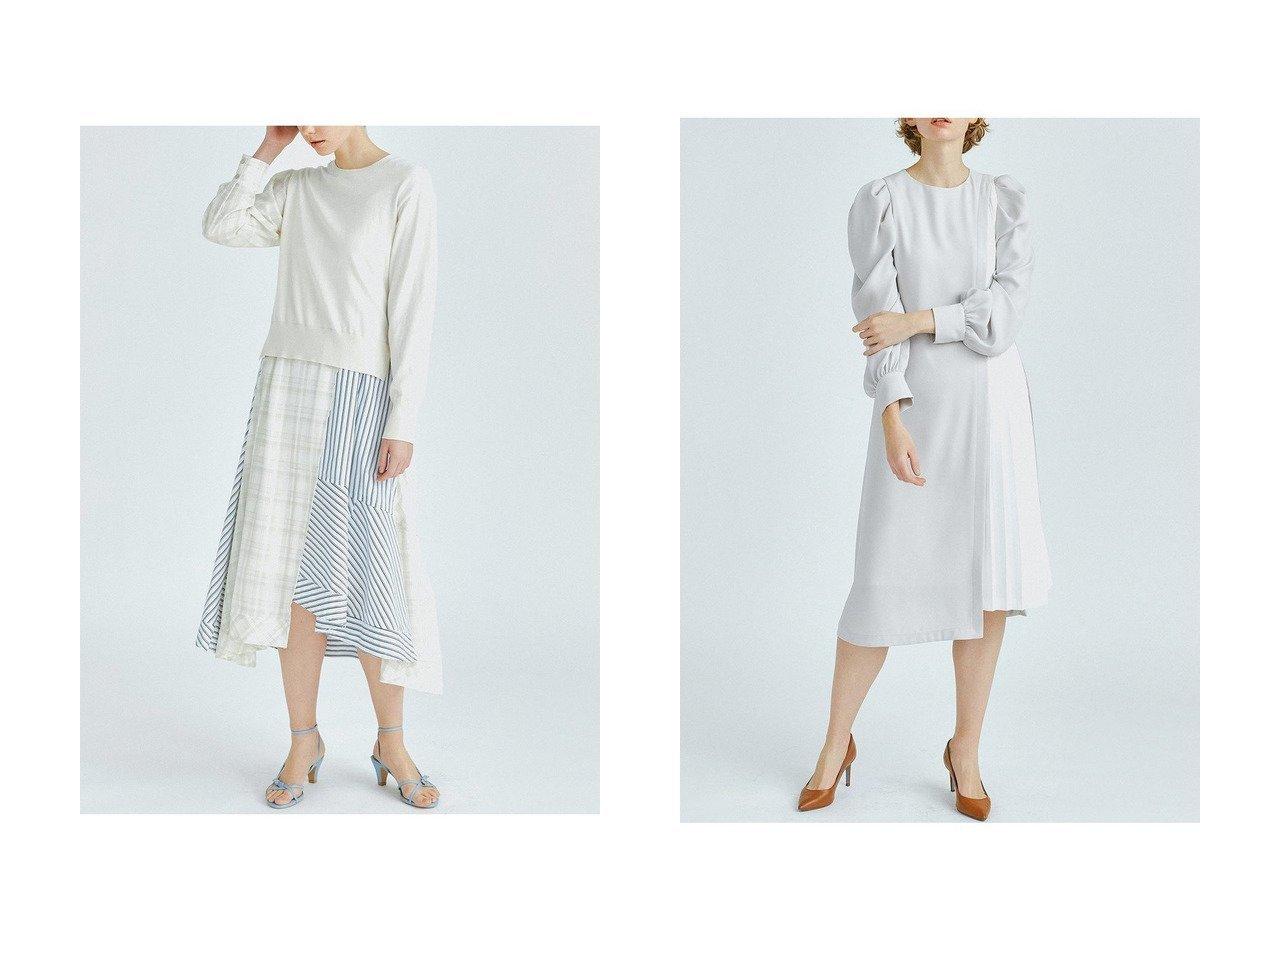 【LANVIN en Bleu/ランバン オン ブルー】のマトンスリーブワンピース&ニットコンビMIXパターンワンピース LANVIN en Bleuのおすすめ!人気、トレンド・レディースファッションの通販 おすすめで人気の流行・トレンド、ファッションの通販商品 メンズファッション・キッズファッション・インテリア・家具・レディースファッション・服の通販 founy(ファニー) https://founy.com/ ファッション Fashion レディースファッション WOMEN ワンピース Dress イレギュラー エレガント 春 Spring キャミワンピース コンビ ストライプ チェック トレンド パターン リメイク ロング 2021年 2021 S/S 春夏 SS Spring/Summer 2021 春夏 S/S SS Spring/Summer 2021 |ID:crp329100000019524